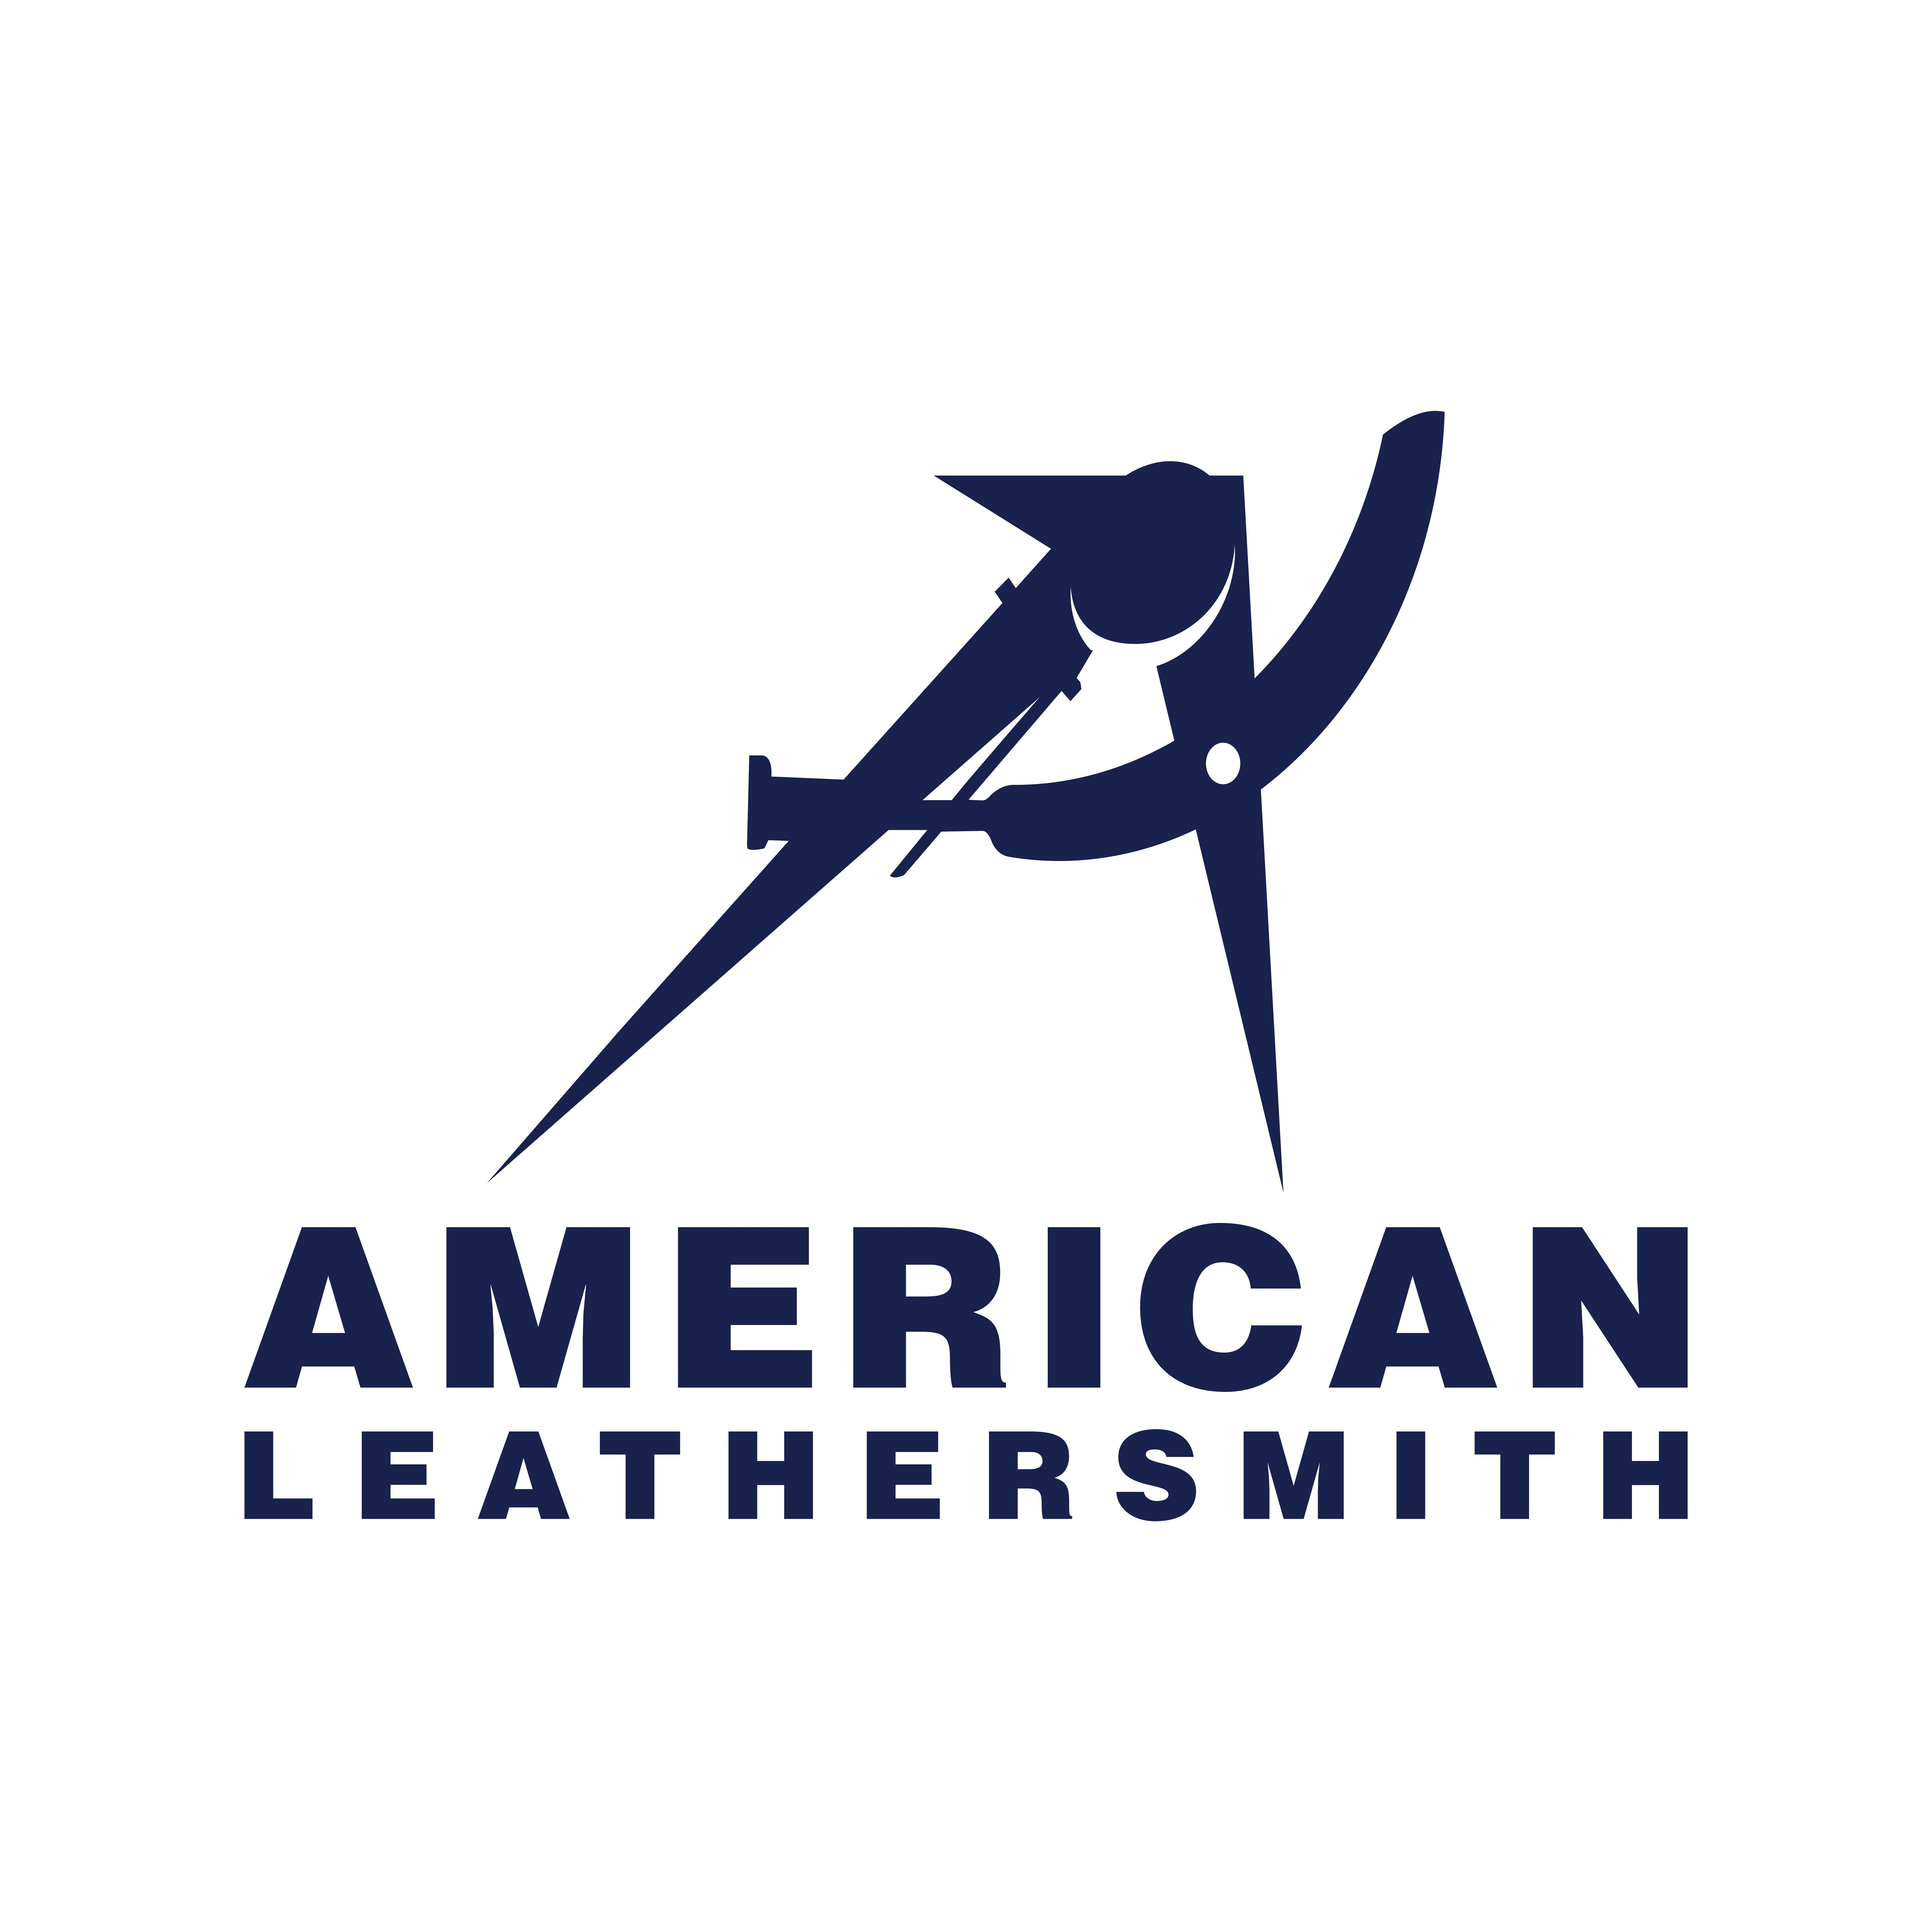 American Leathersmith needs a new powerful, masculine logo